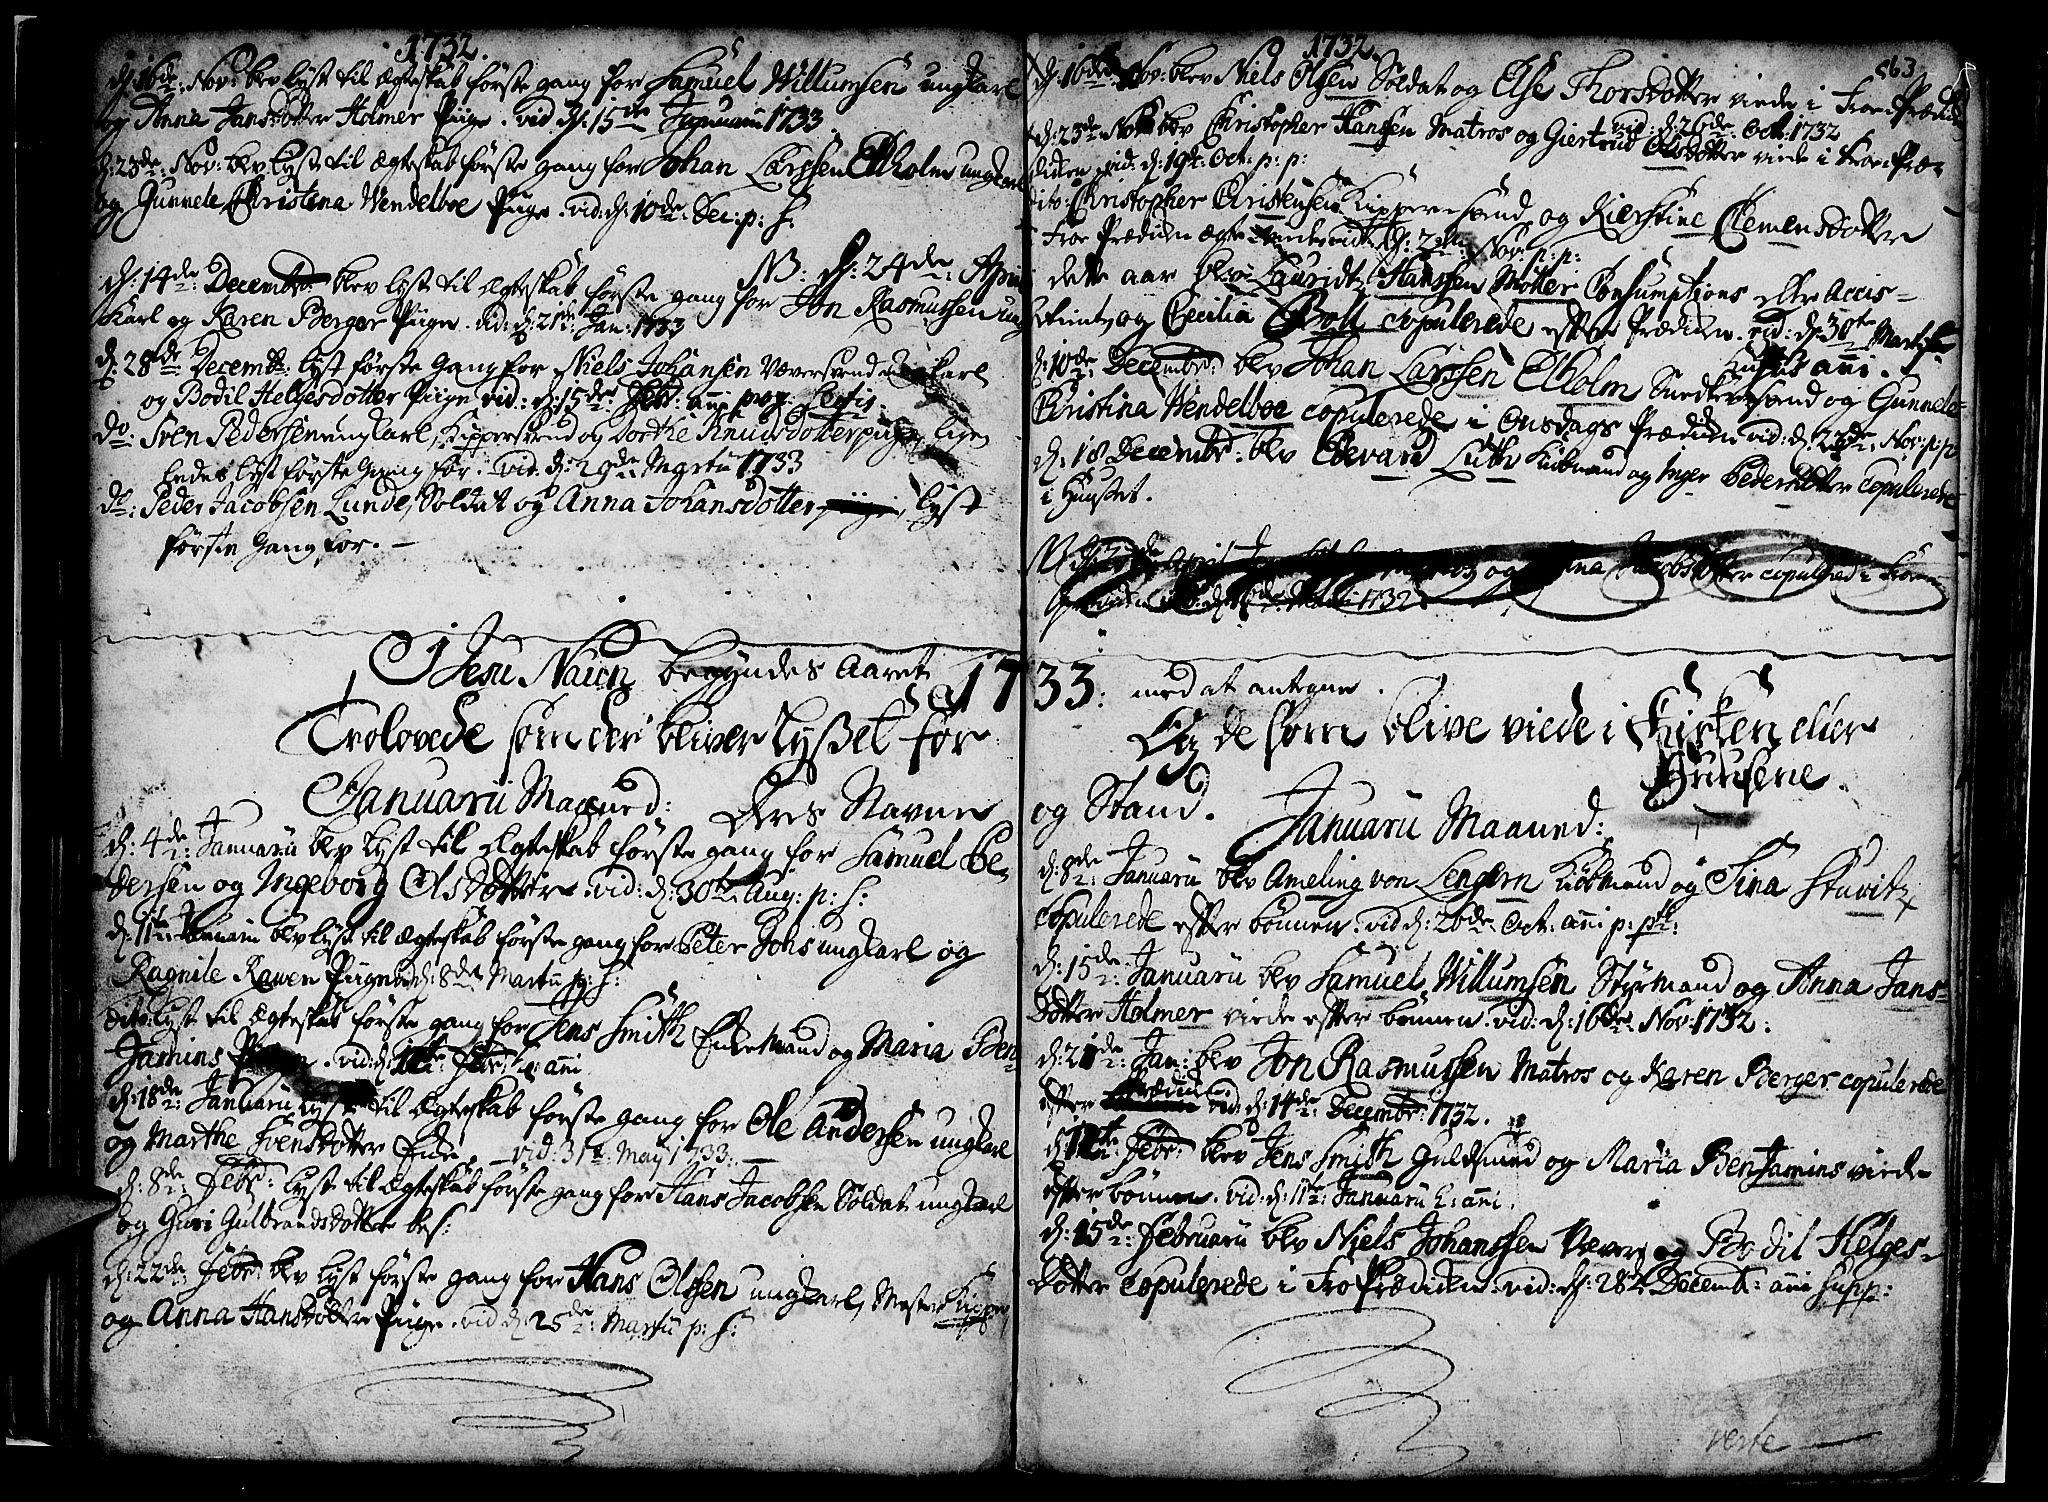 SAB, Nykirken Sokneprestembete, H/Haa: Ministerialbok nr. A 7, 1719-1781, s. 63